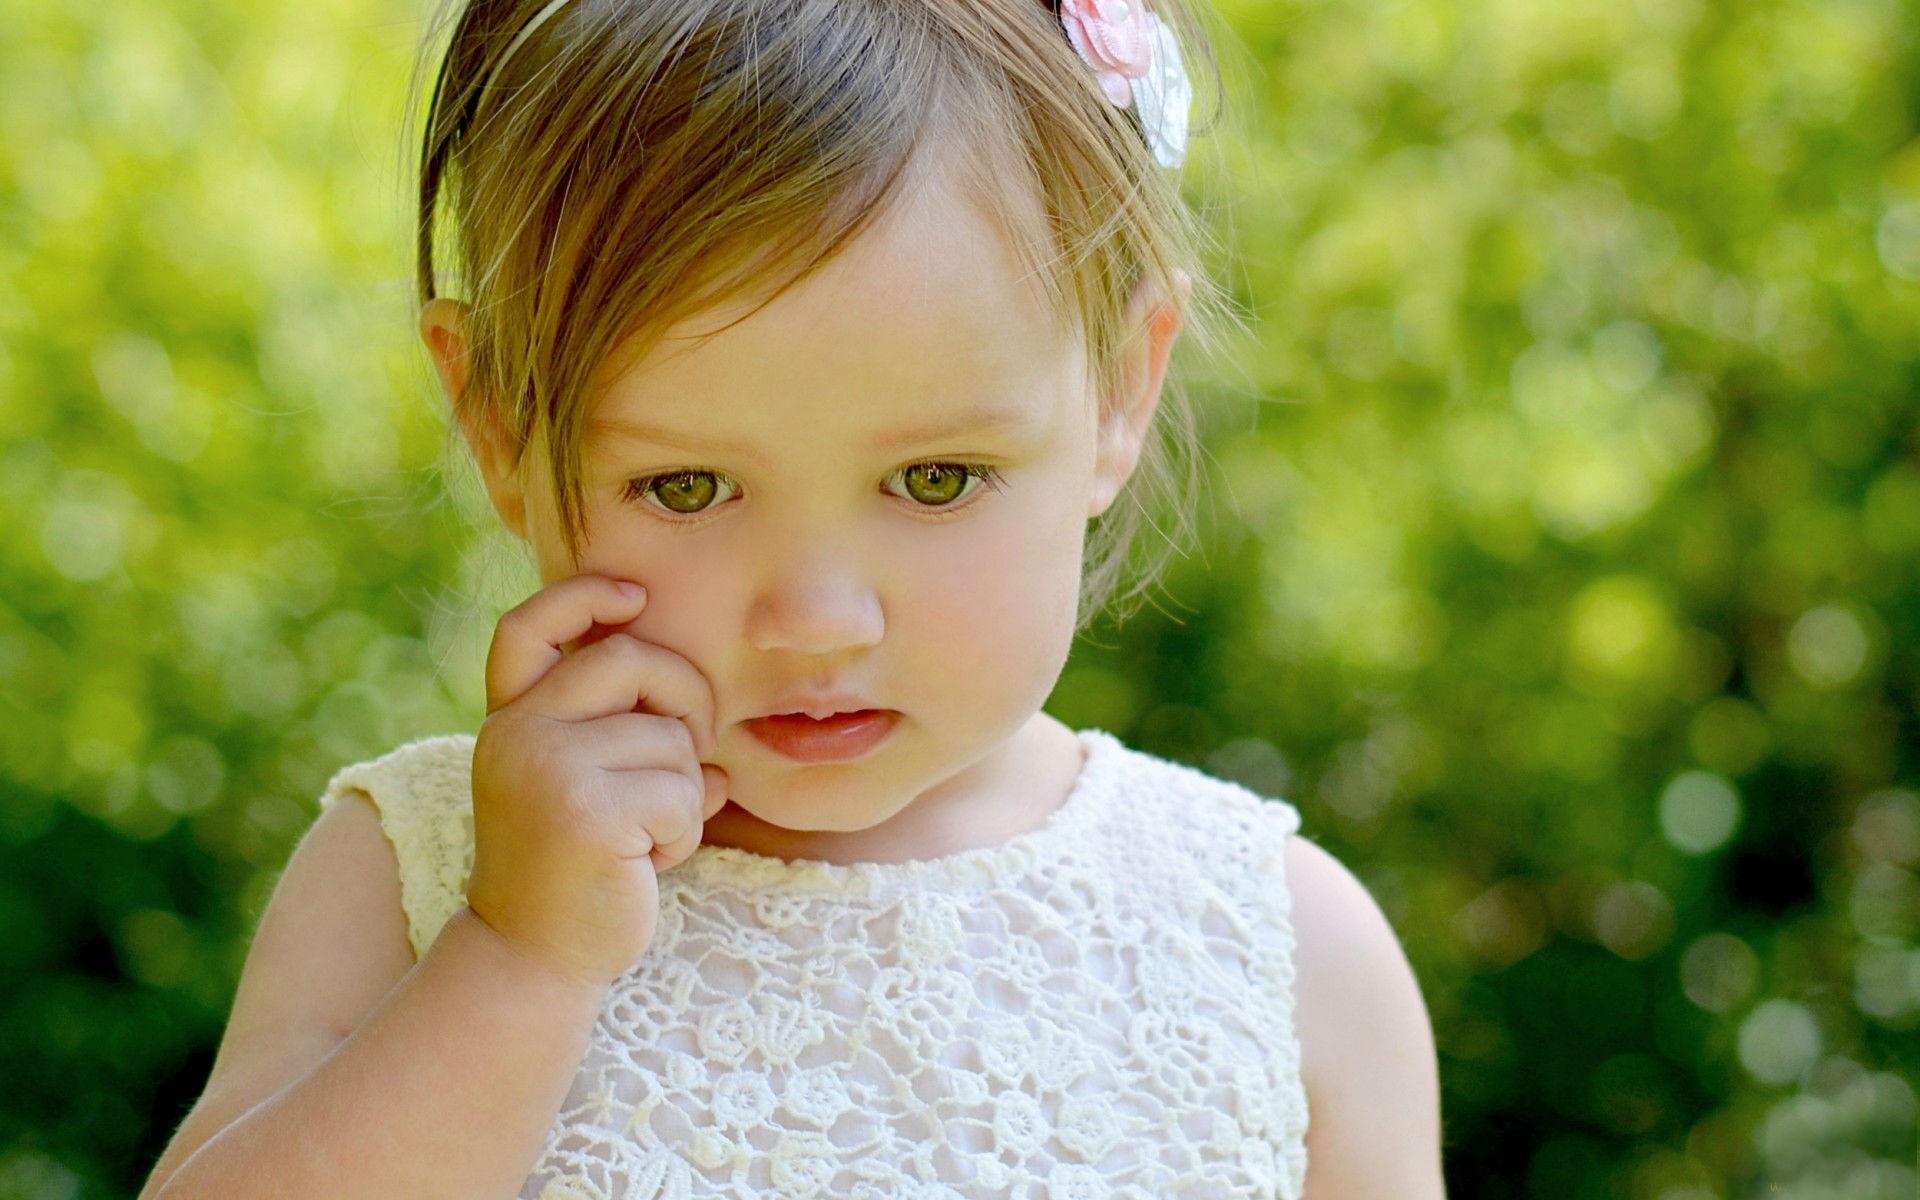 بالصور صور اطفال اطفال , اطفال كيوت 1629 5